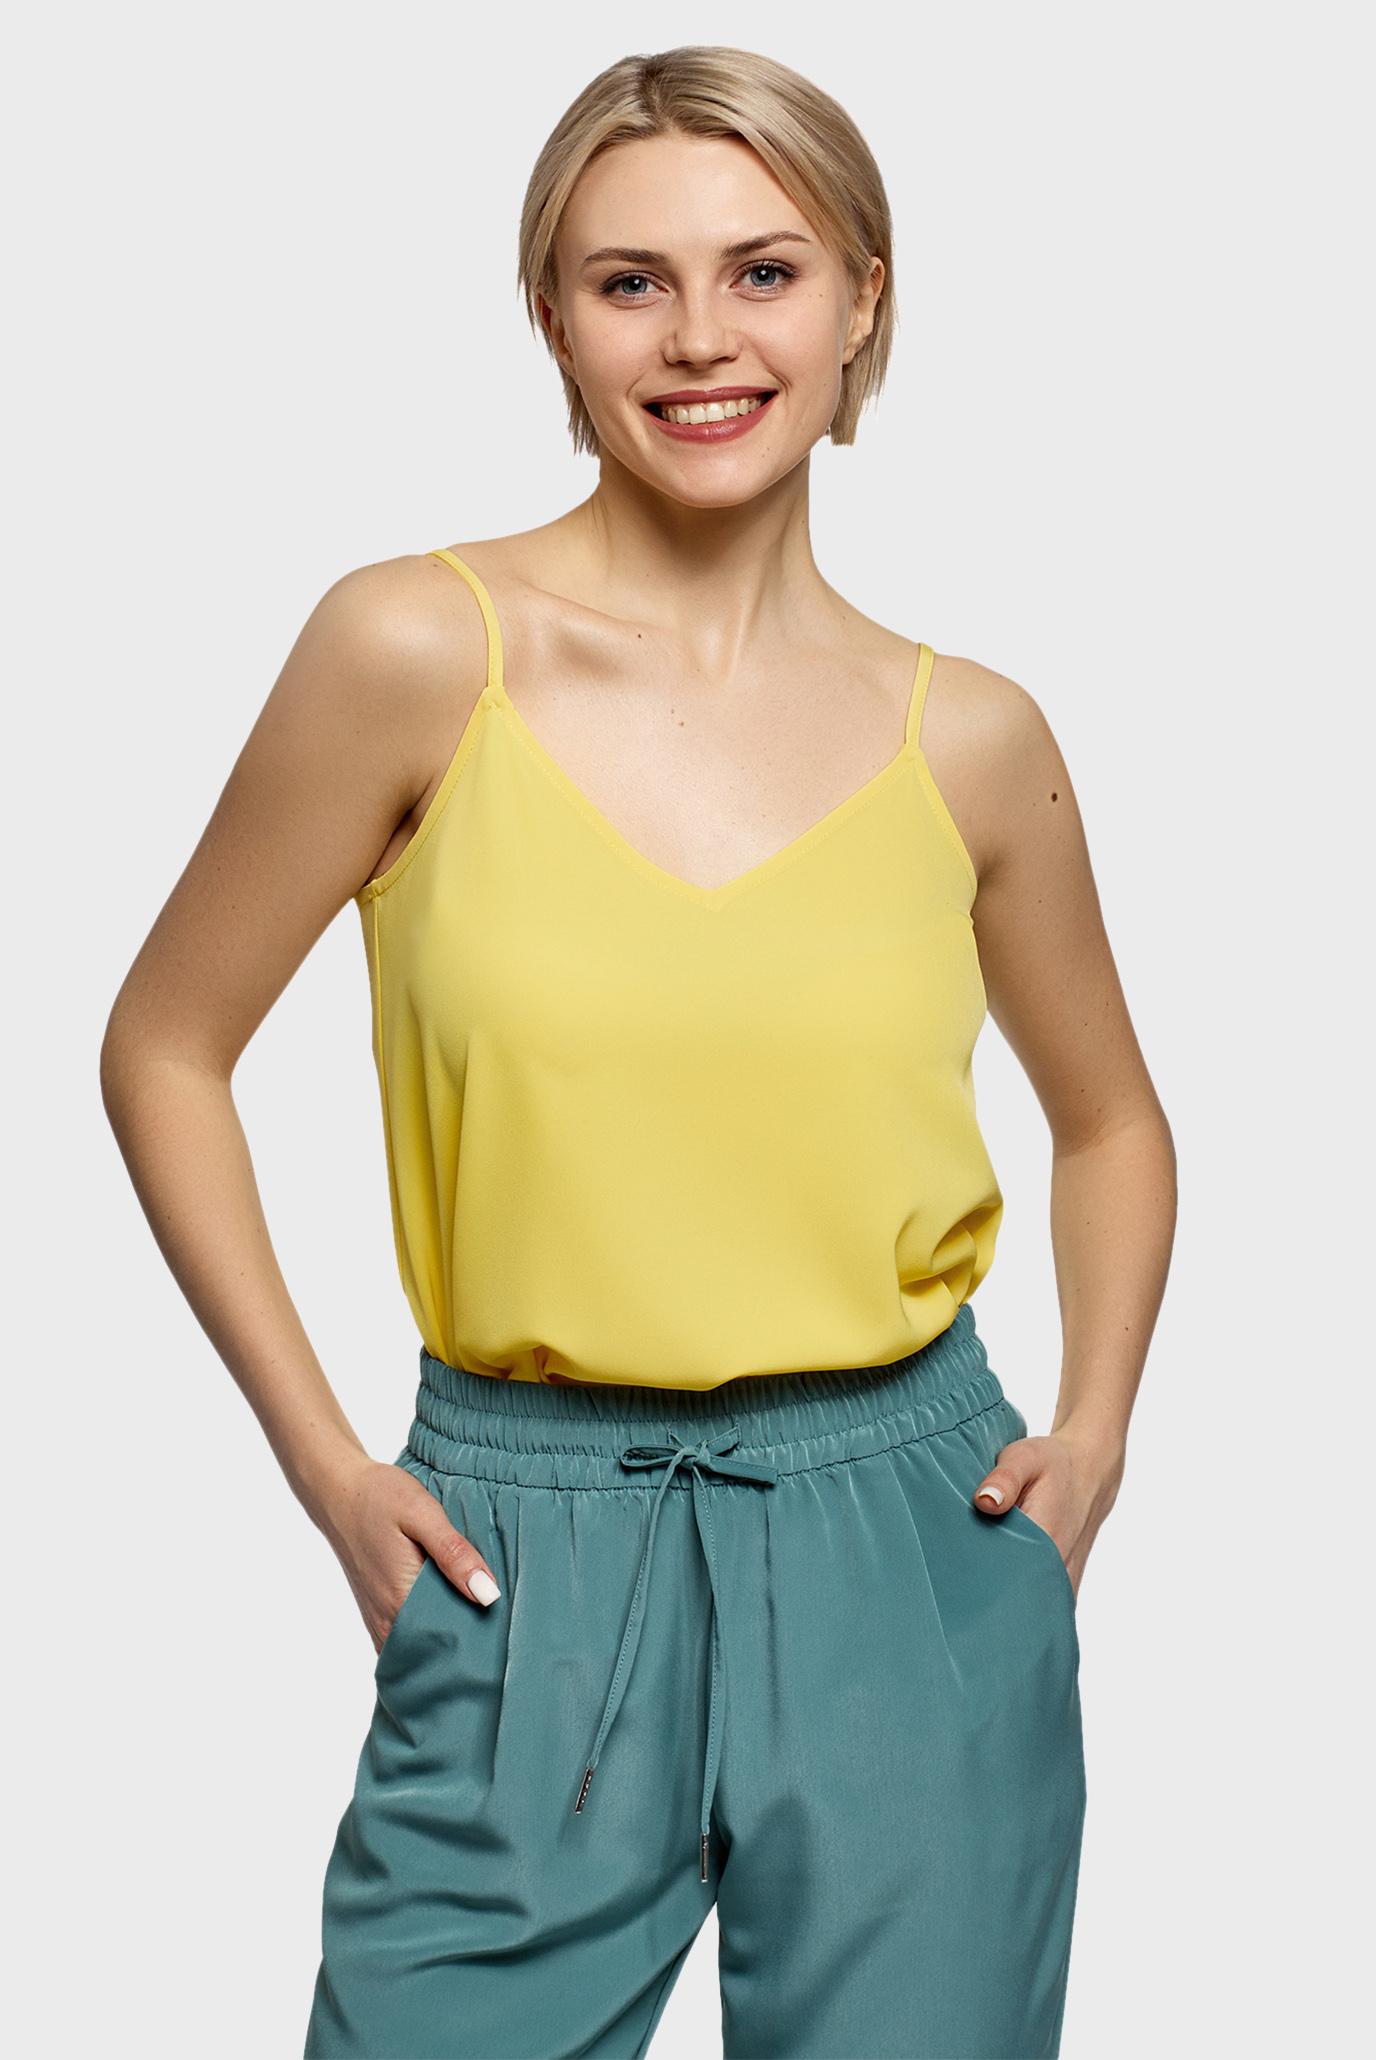 Жіночий жовтий топ 1